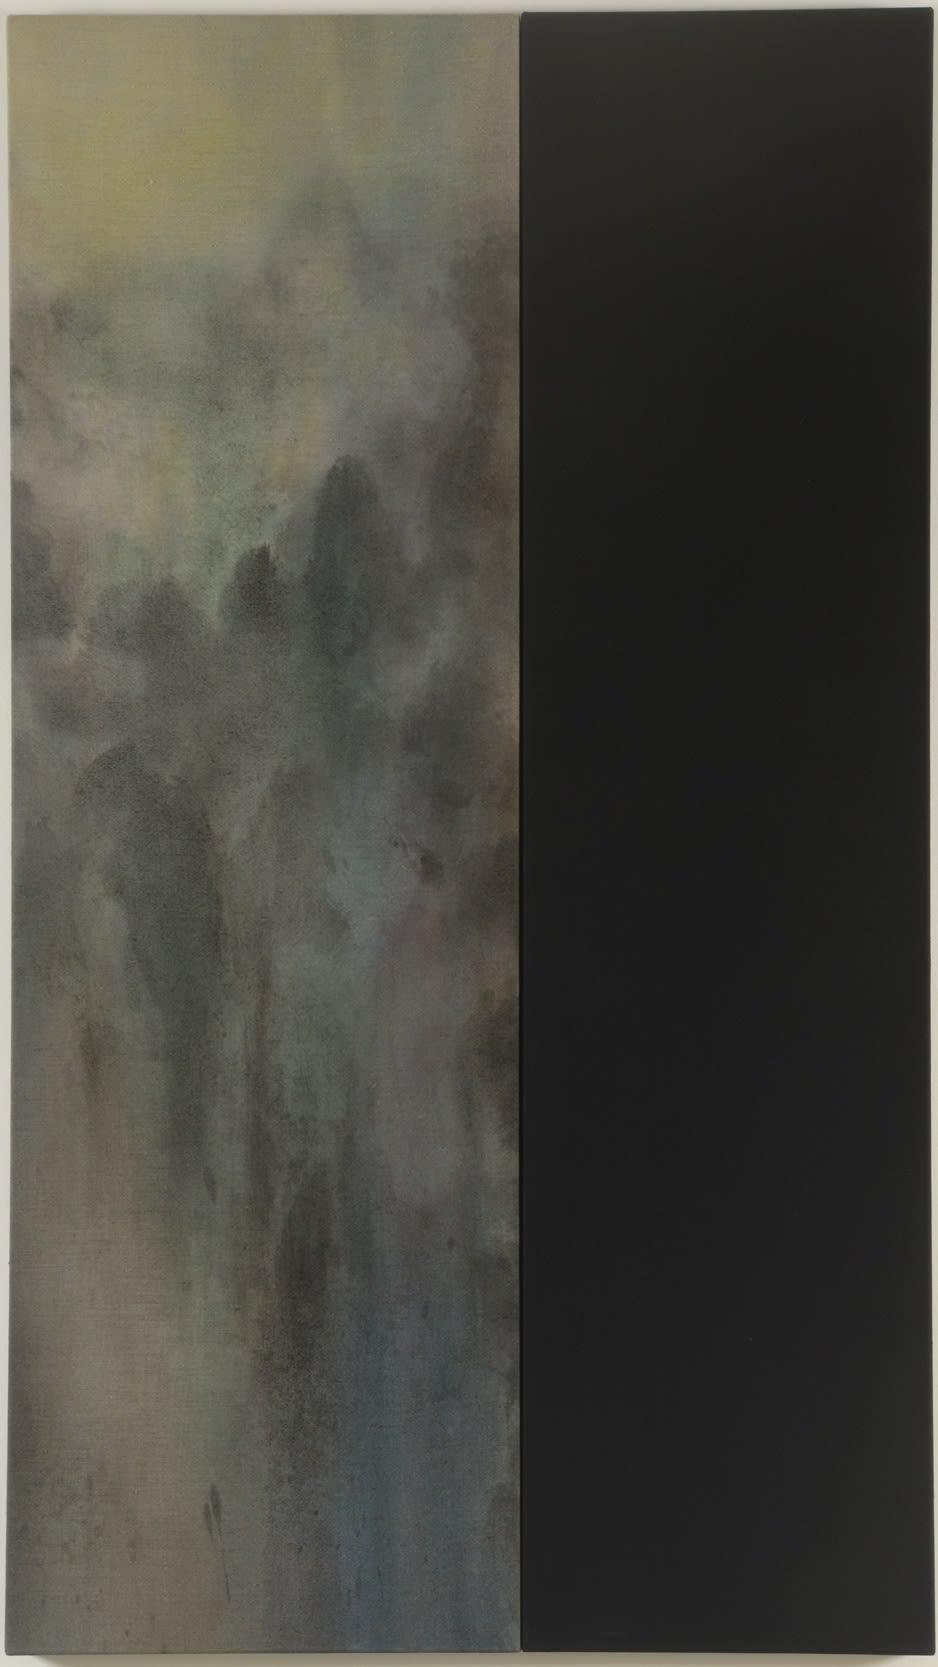 Michael Biberstein Sem título Acrilíco s/ linho 160 x 91 x 5 cm